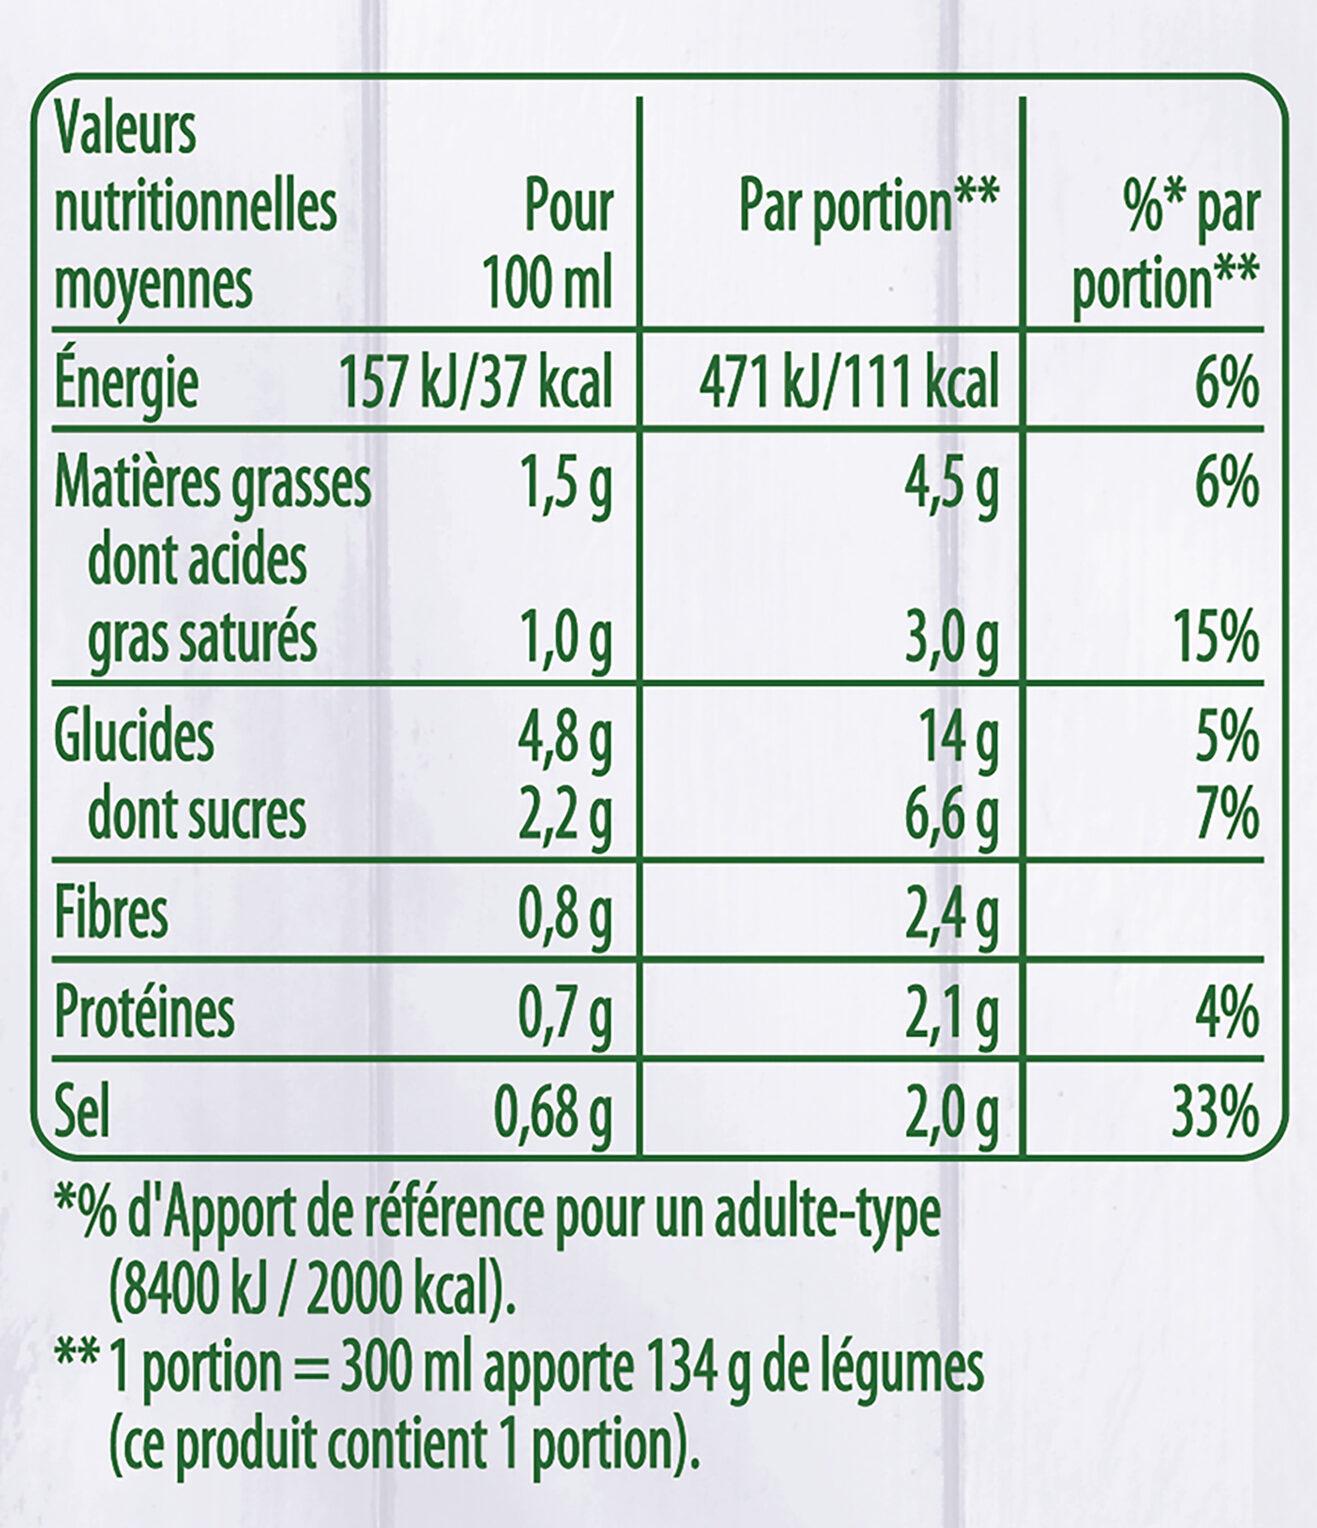 Knorr Bio Soupe Liquide Mouliné de Potiron Carottes Brique 30cl - Información nutricional - fr